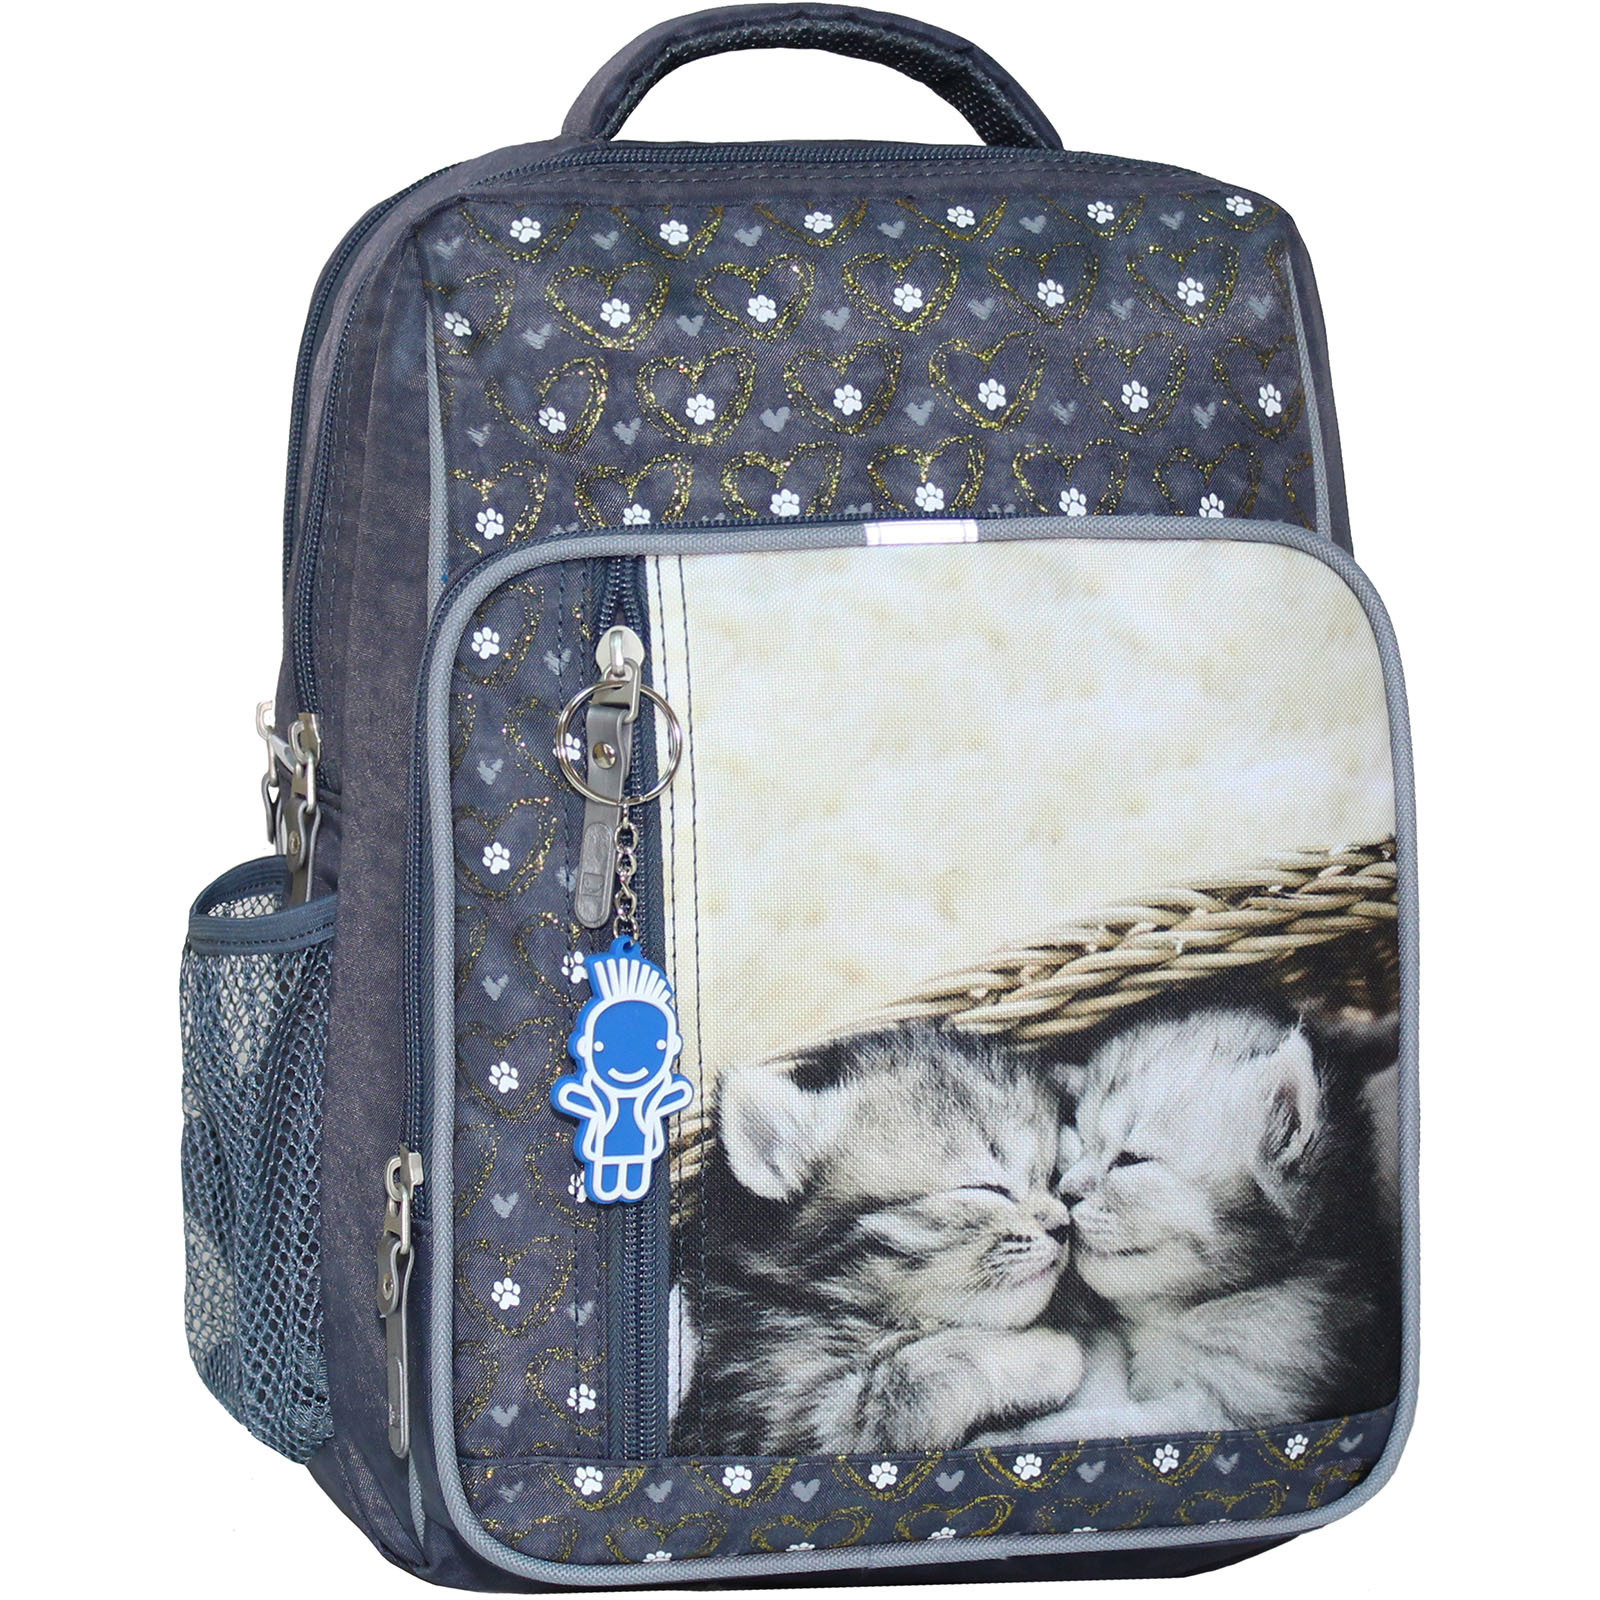 Школьные рюкзаки Рюкзак школьный Bagland Школьник 8 л. 321 серый 165к (00112702) IMG_5242_165К_.JPG